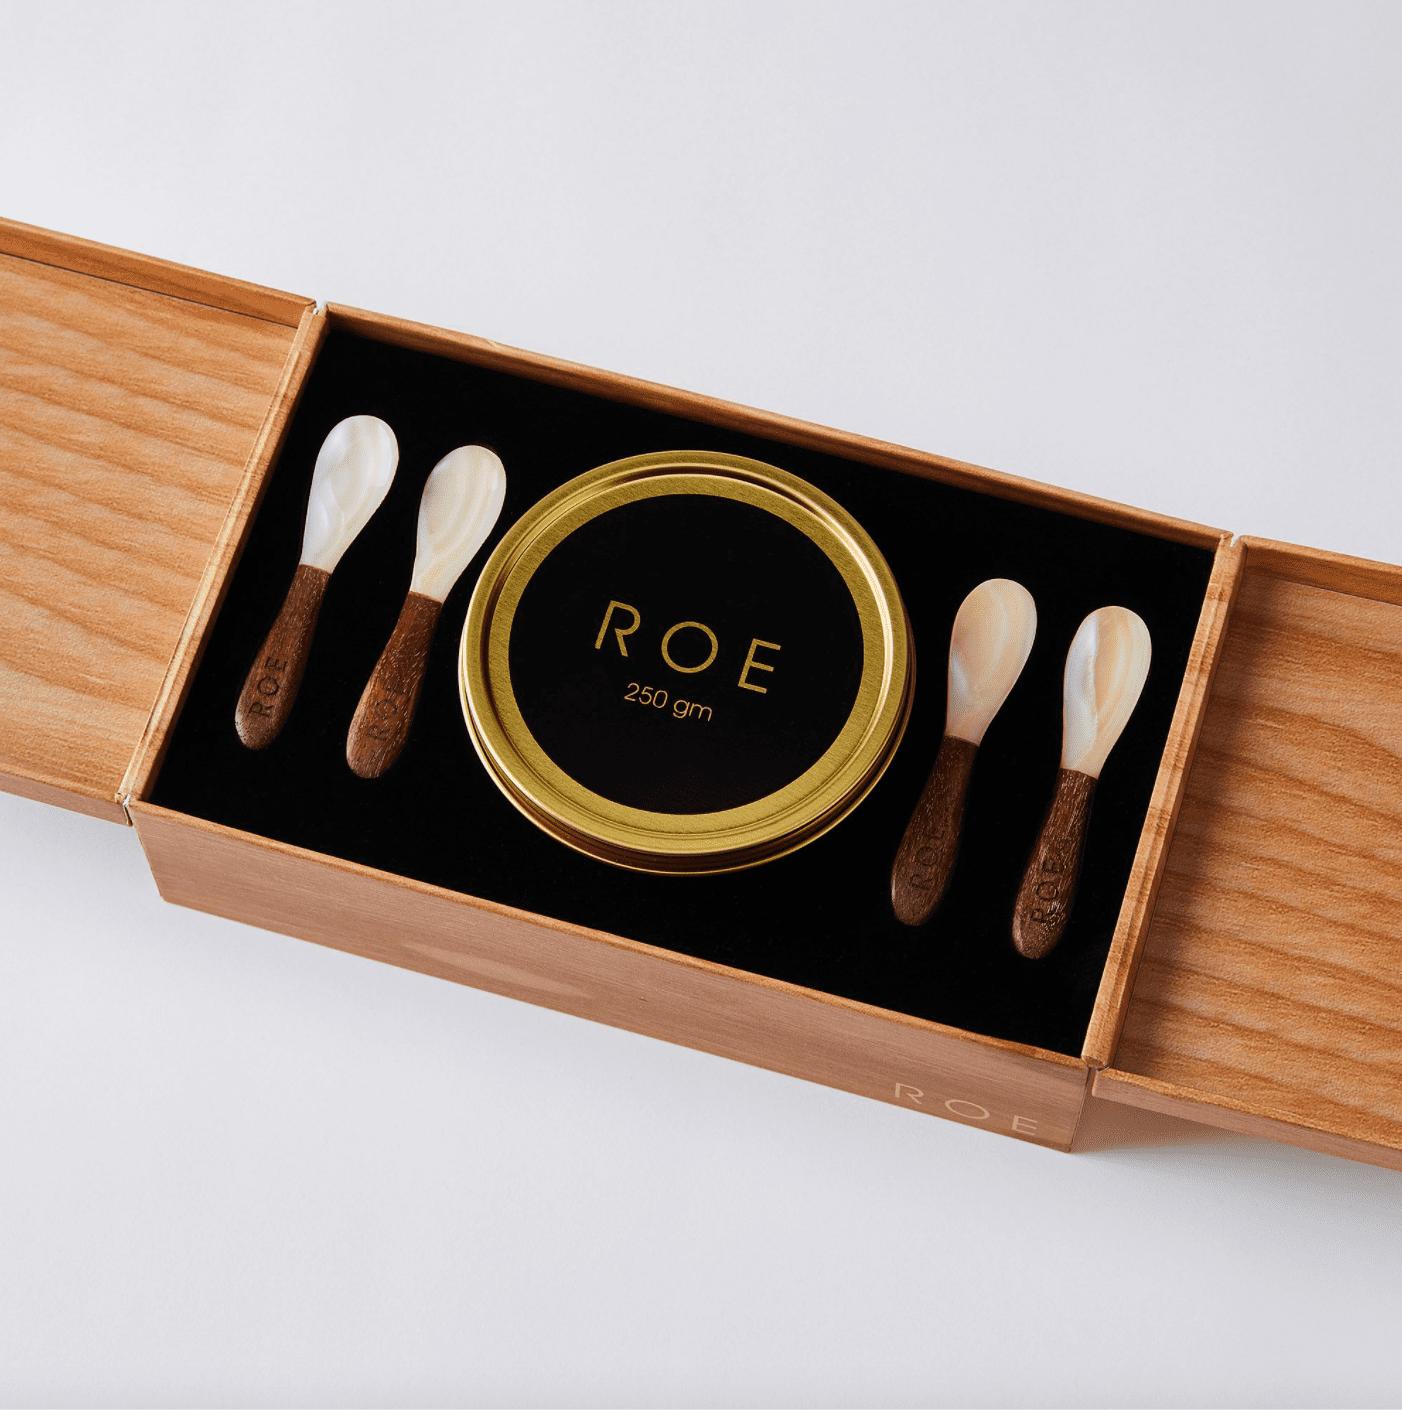 Roe White Sturgeon Caviar Gift Set